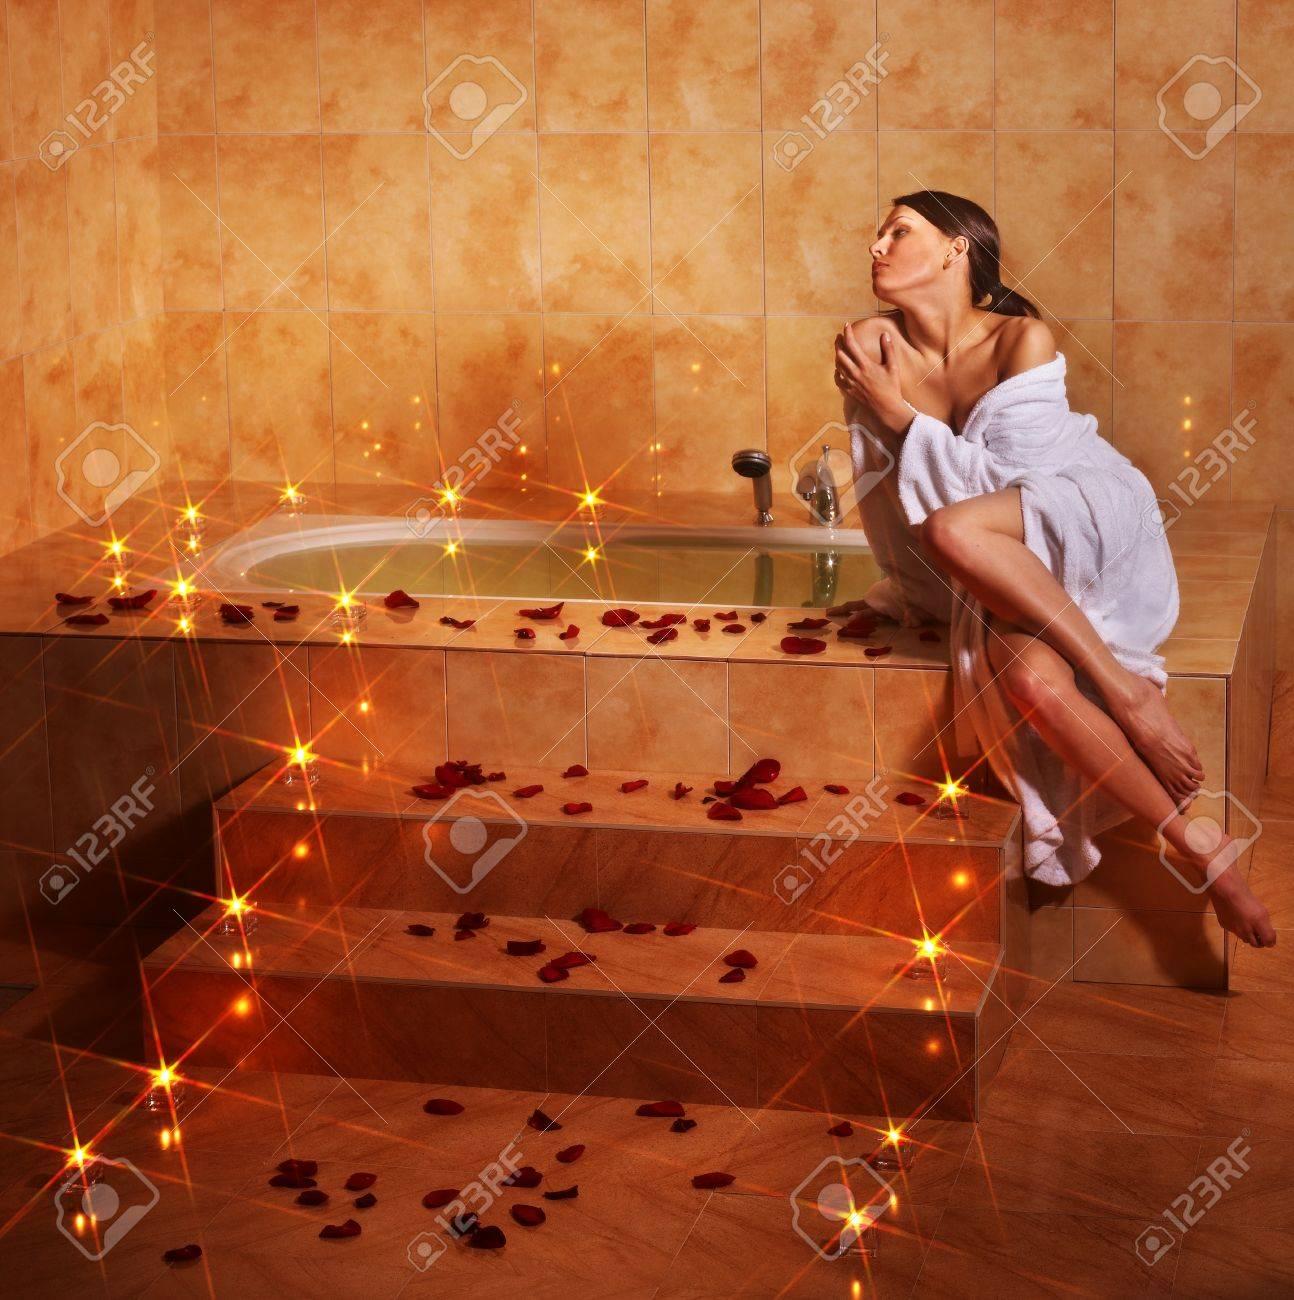 Woman sitting on edge of bath tub. Stock Photo - 9526729